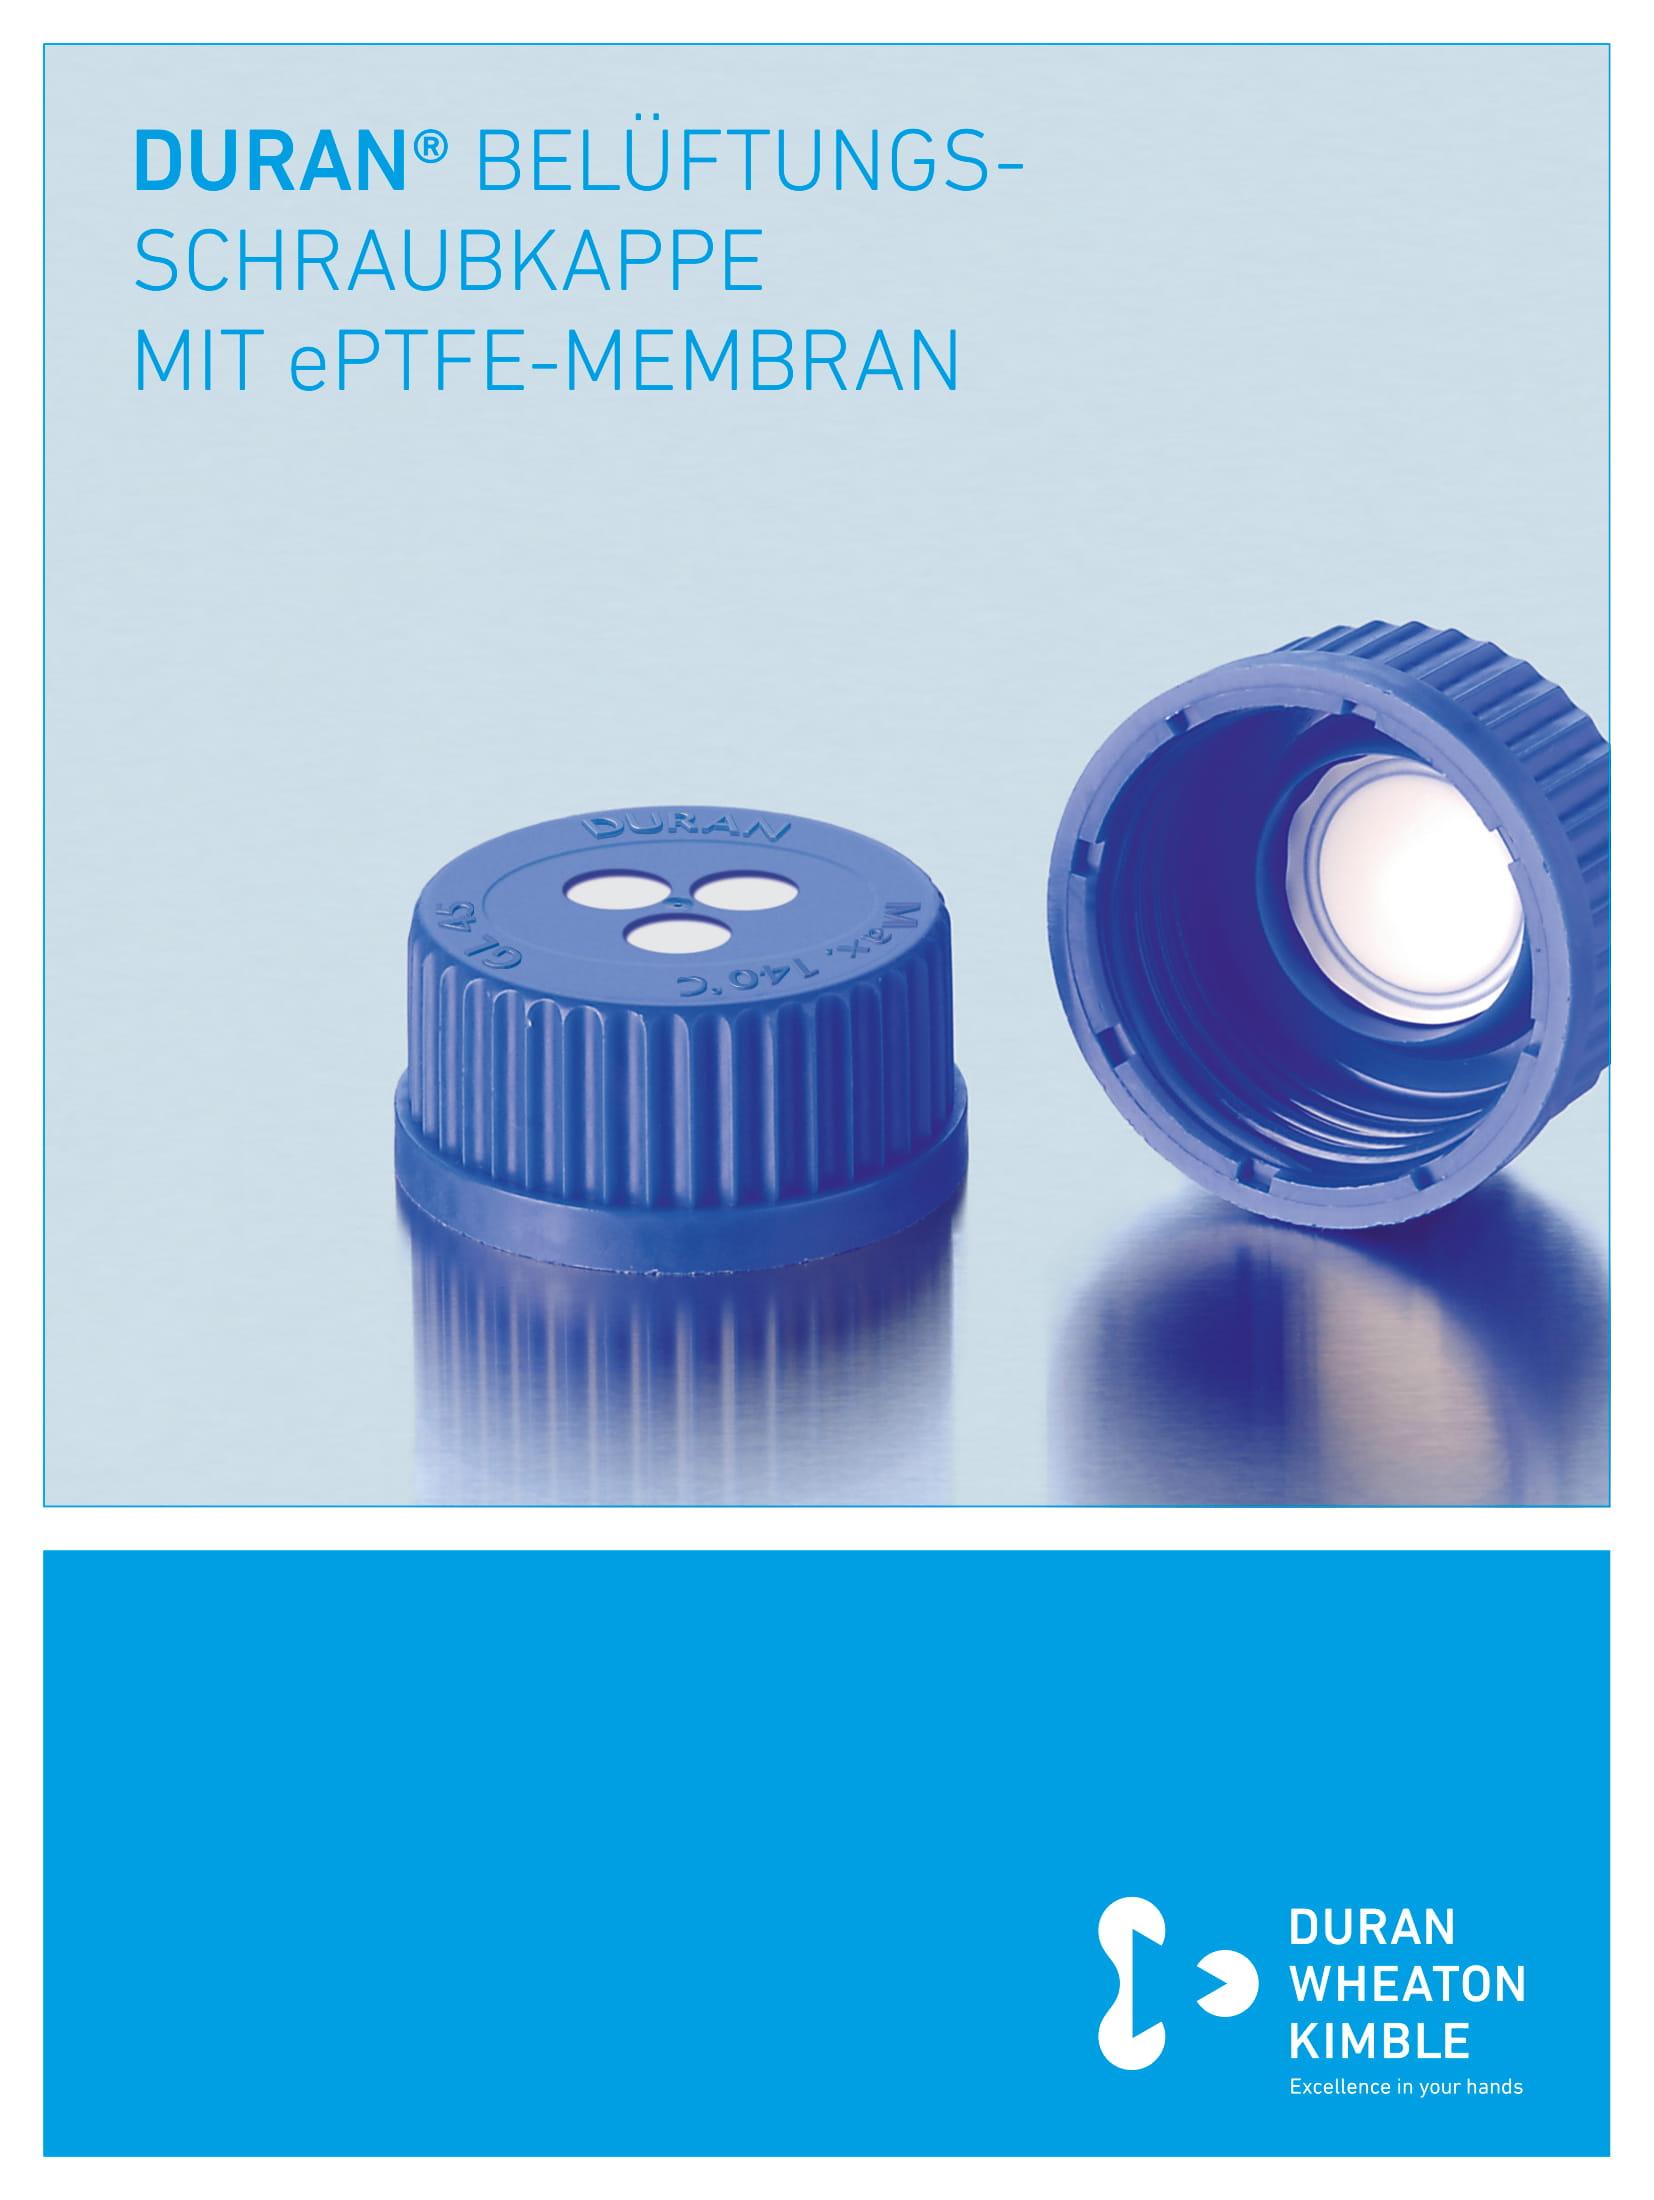 DURAN® Sterile Venting Membrane Screw Caps